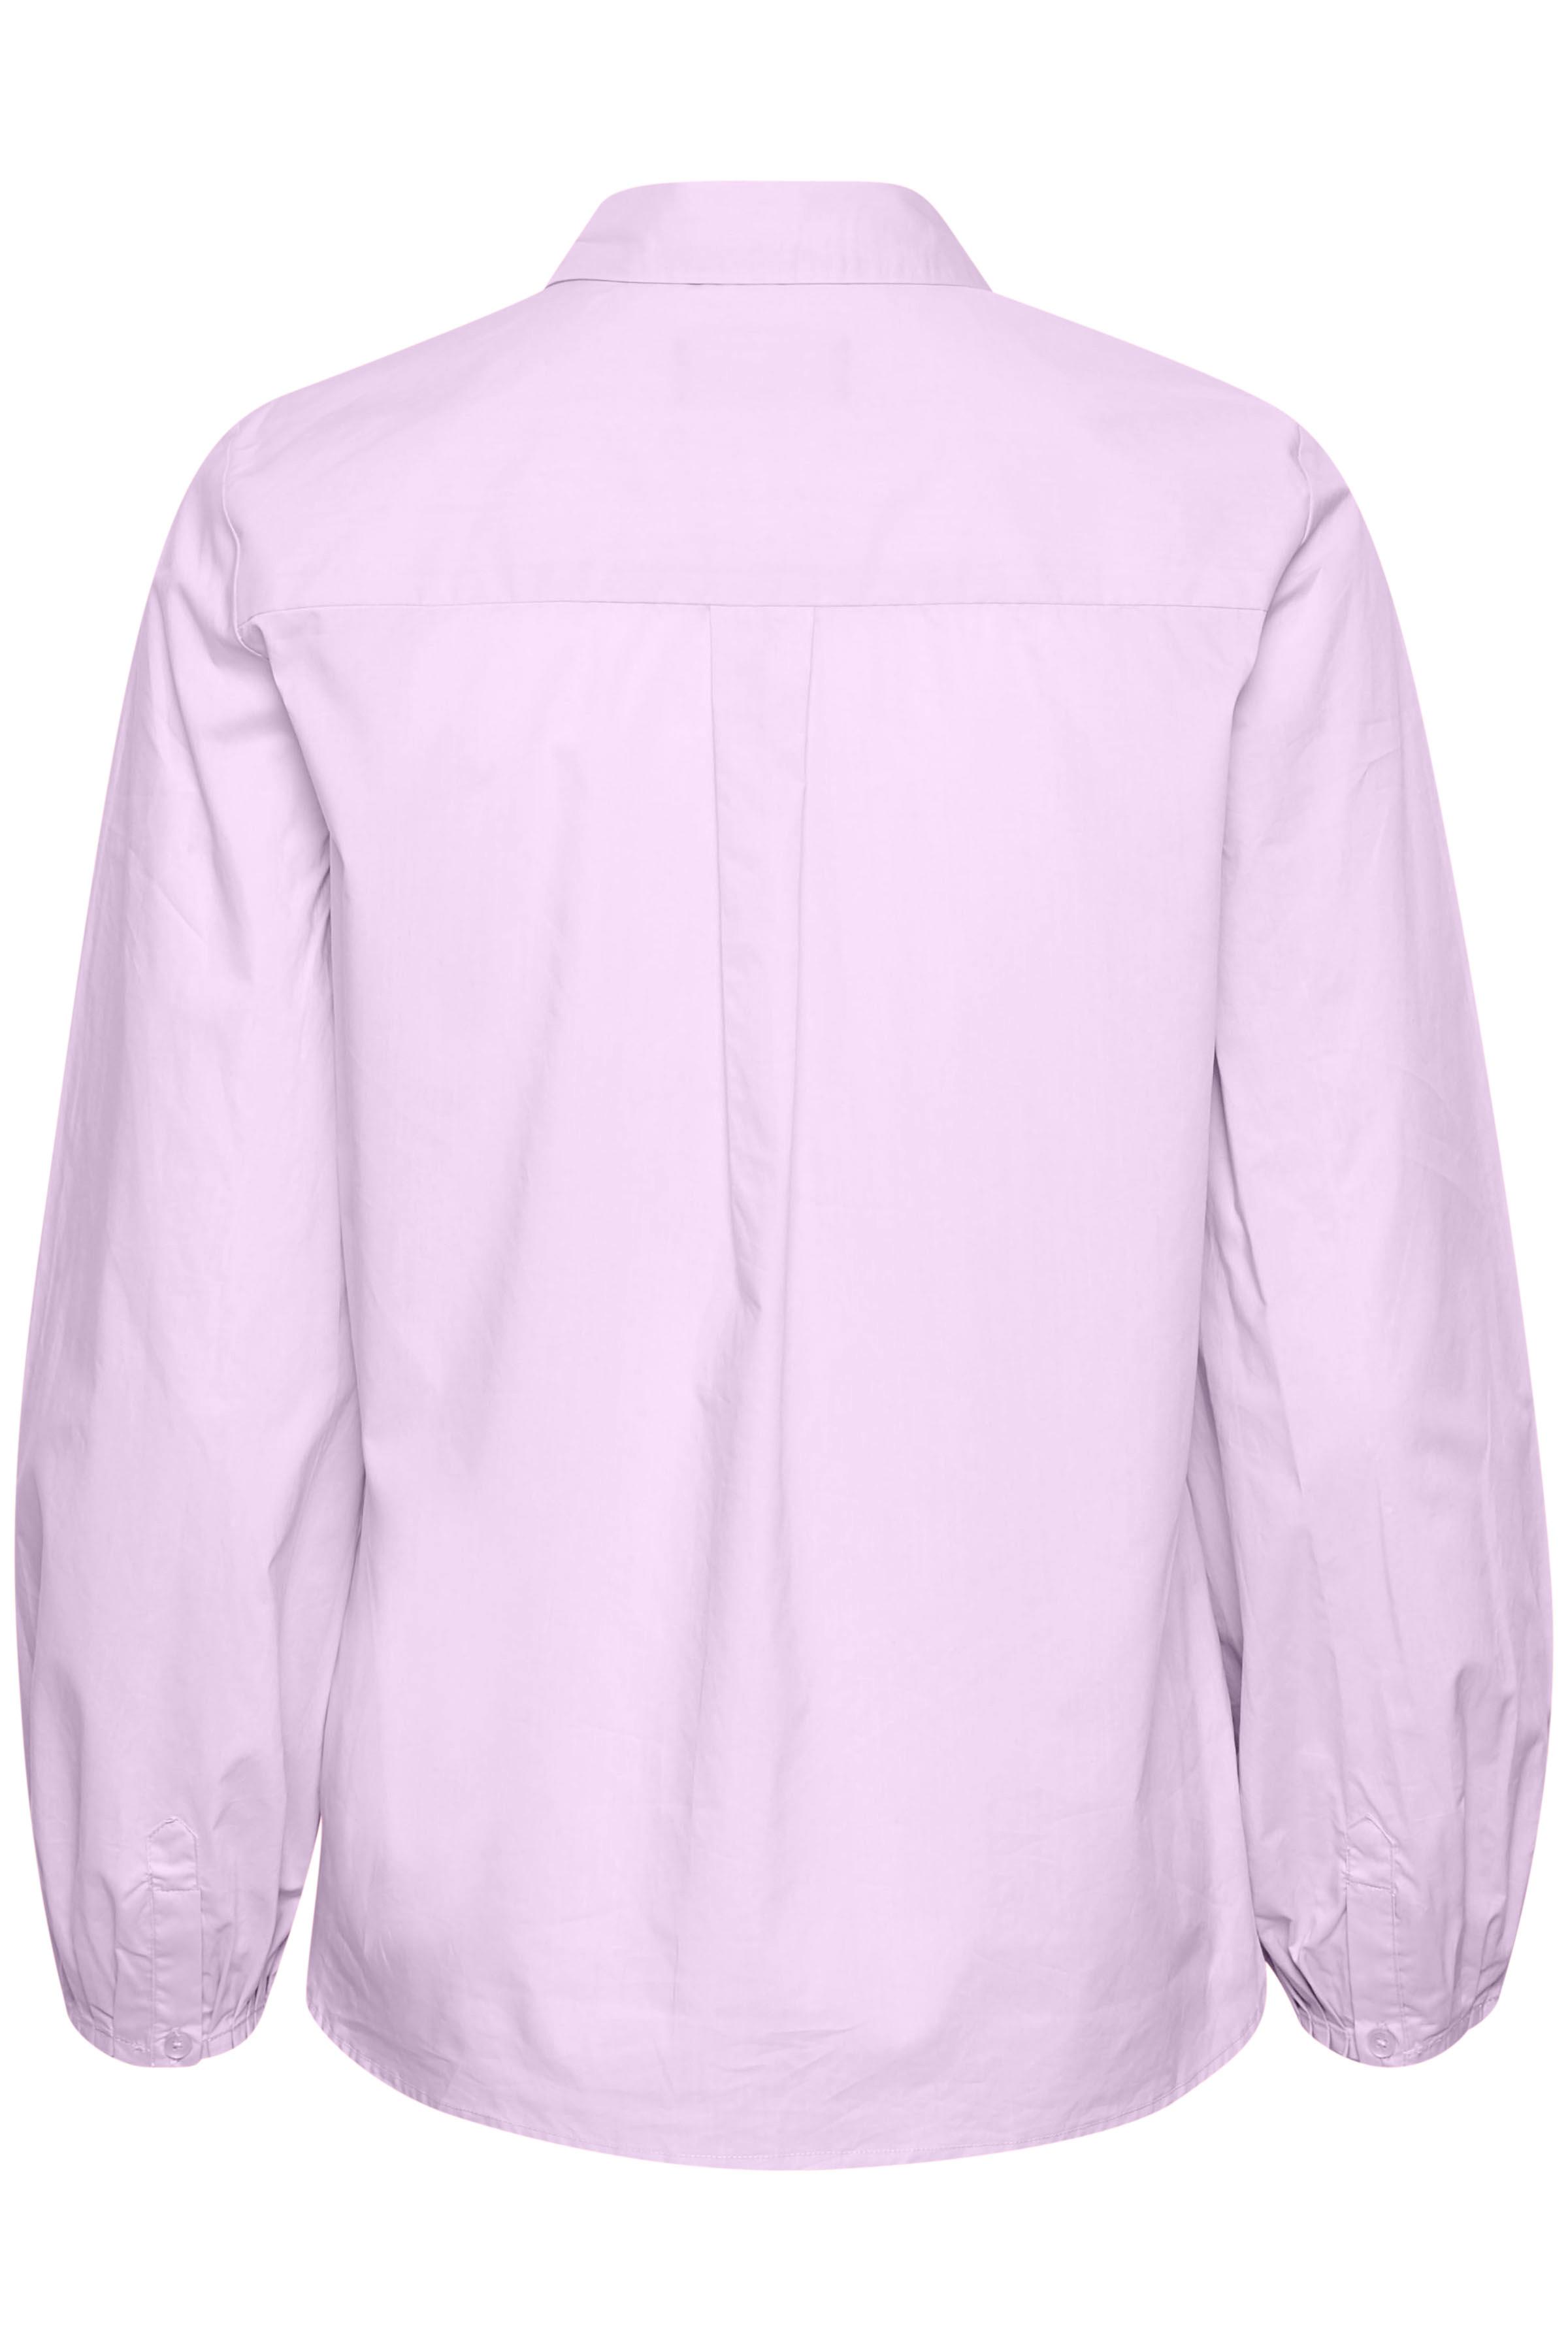 Purple Rose Langærmet skjorte – Køb Purple Rose Langærmet skjorte fra str. 34-44 her